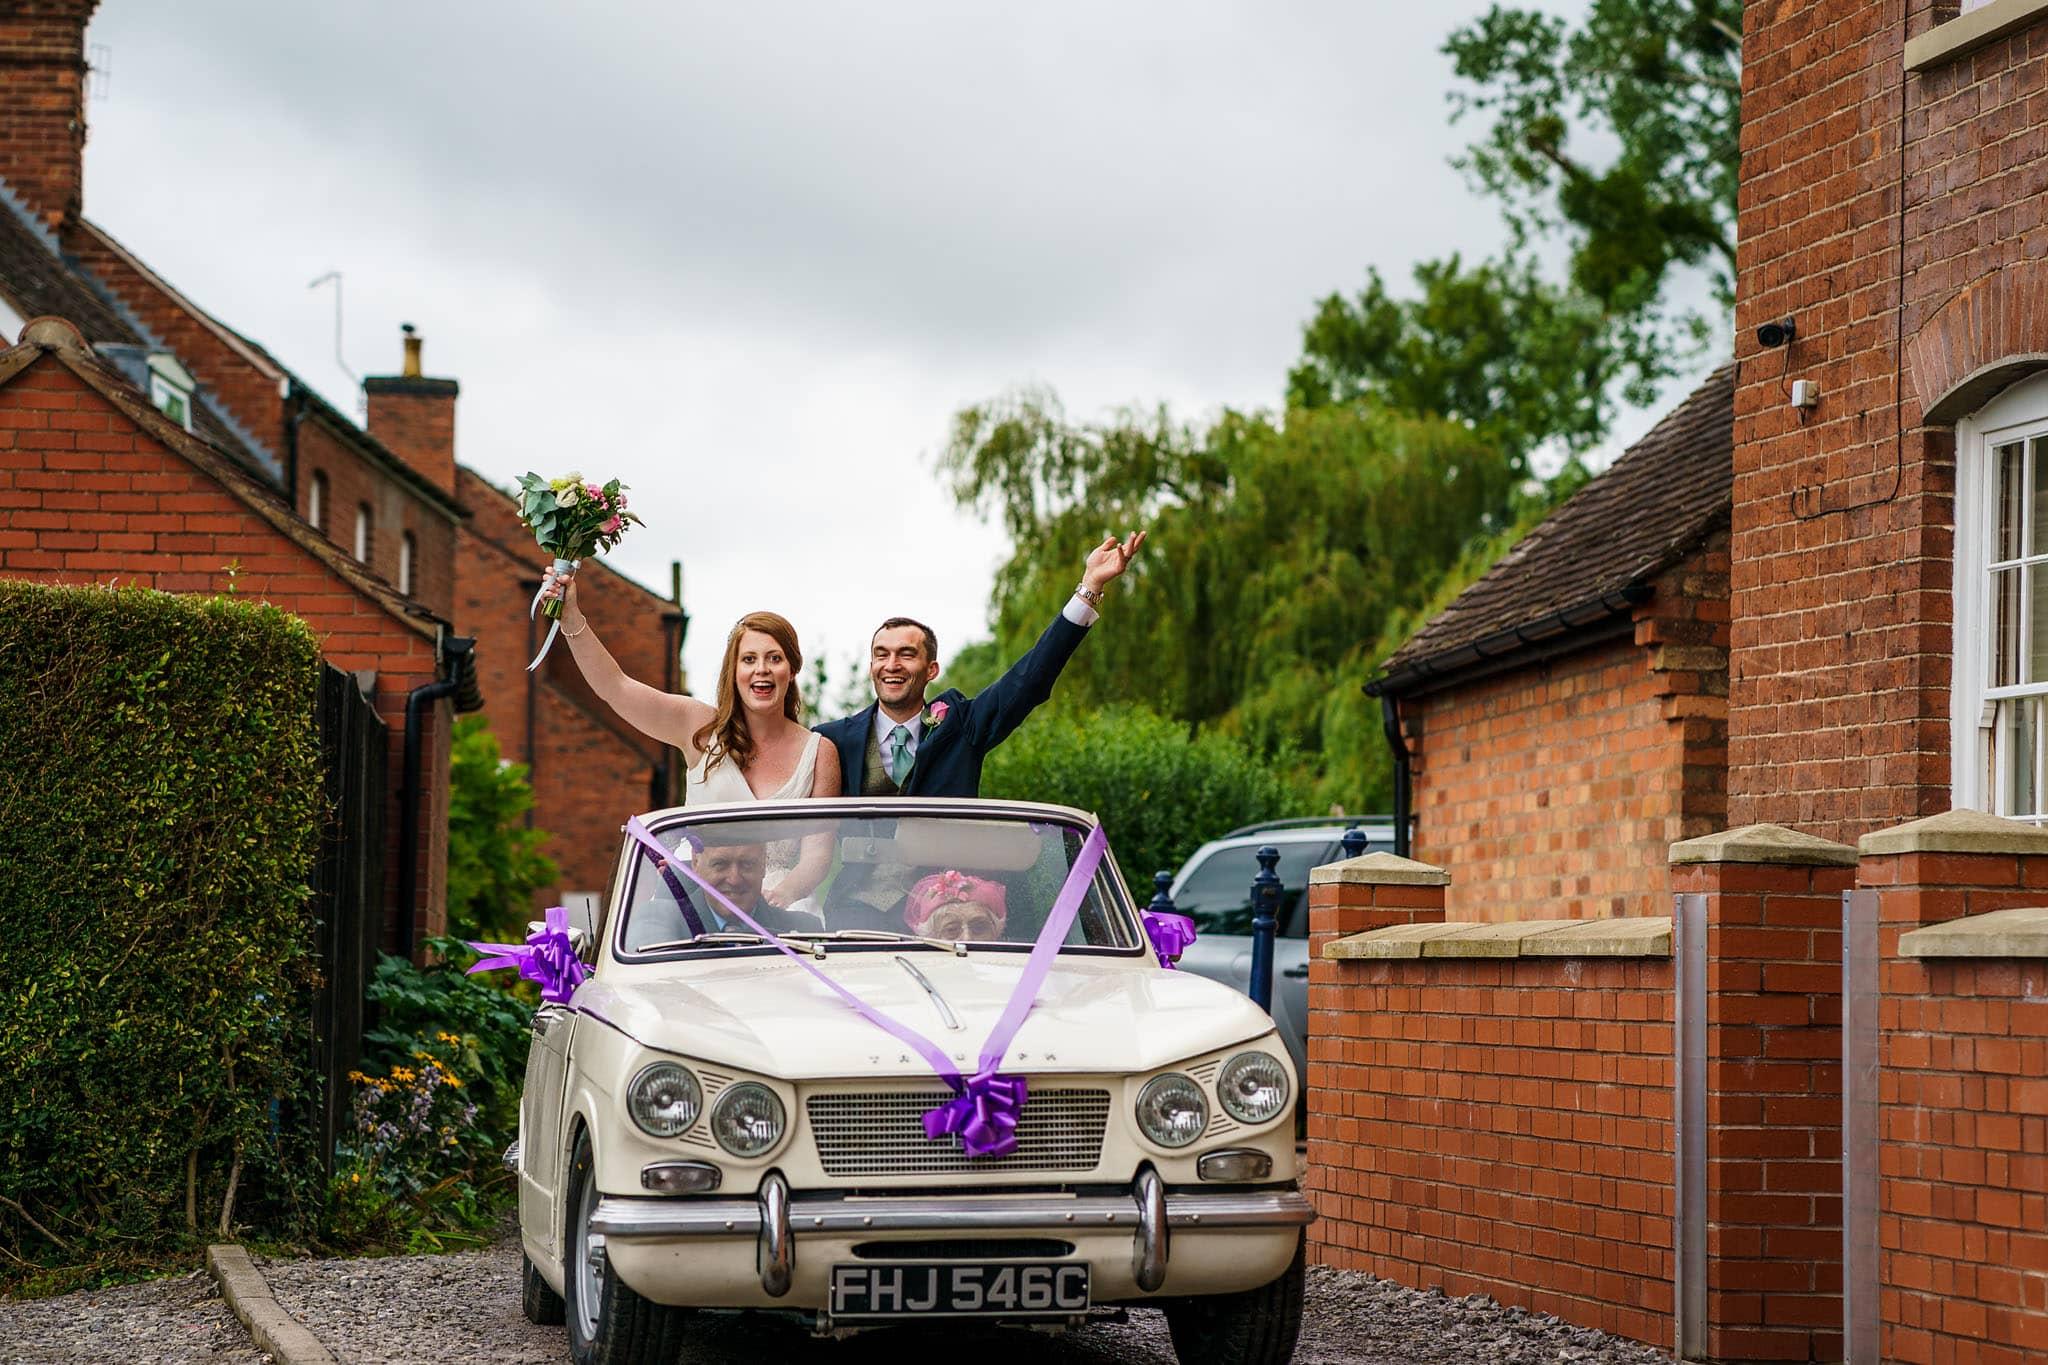 bride and groom arrival in vintage car